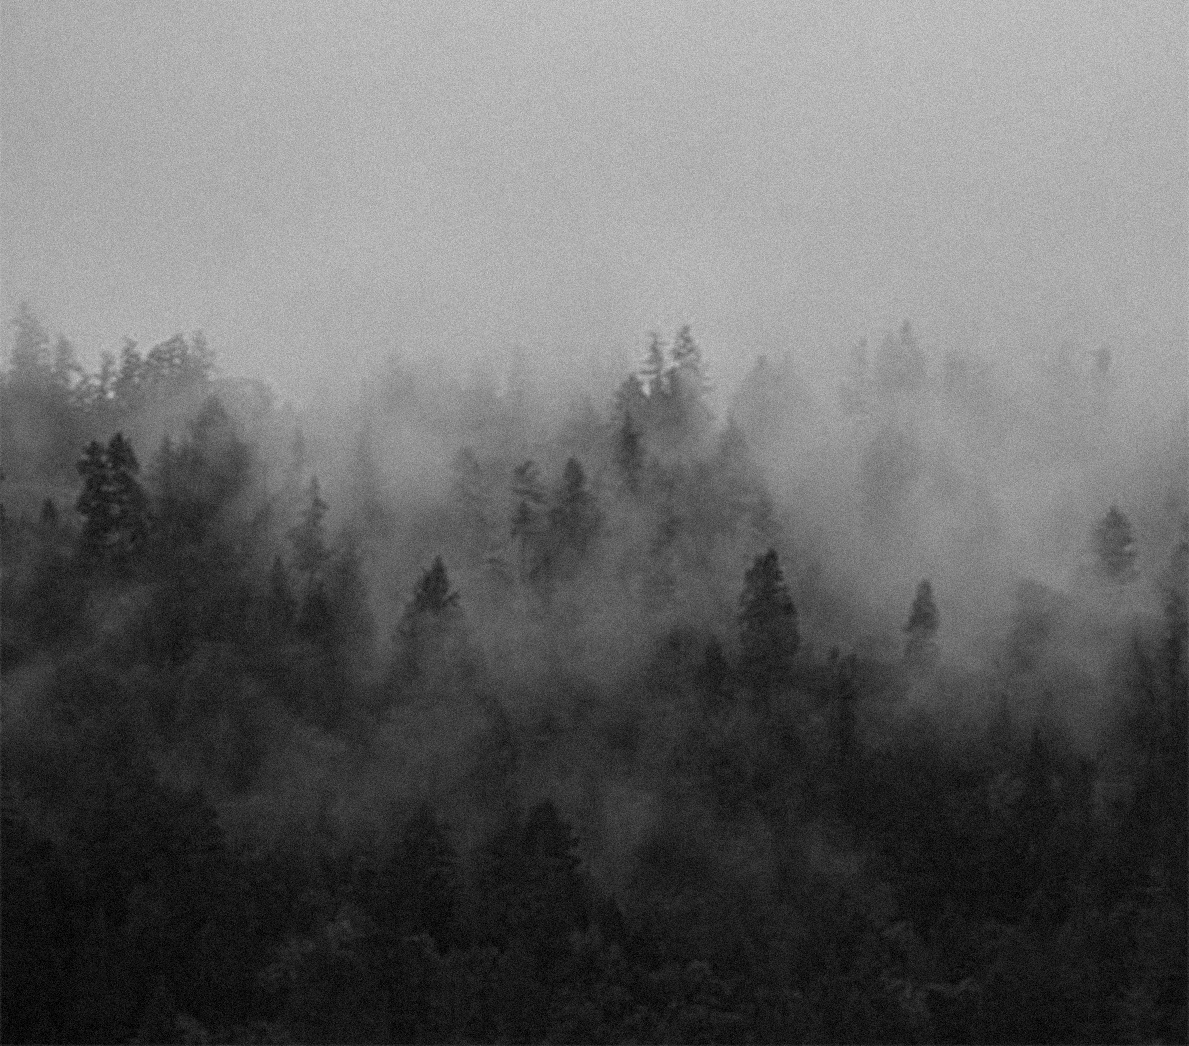 forest_filmgrain.jpg